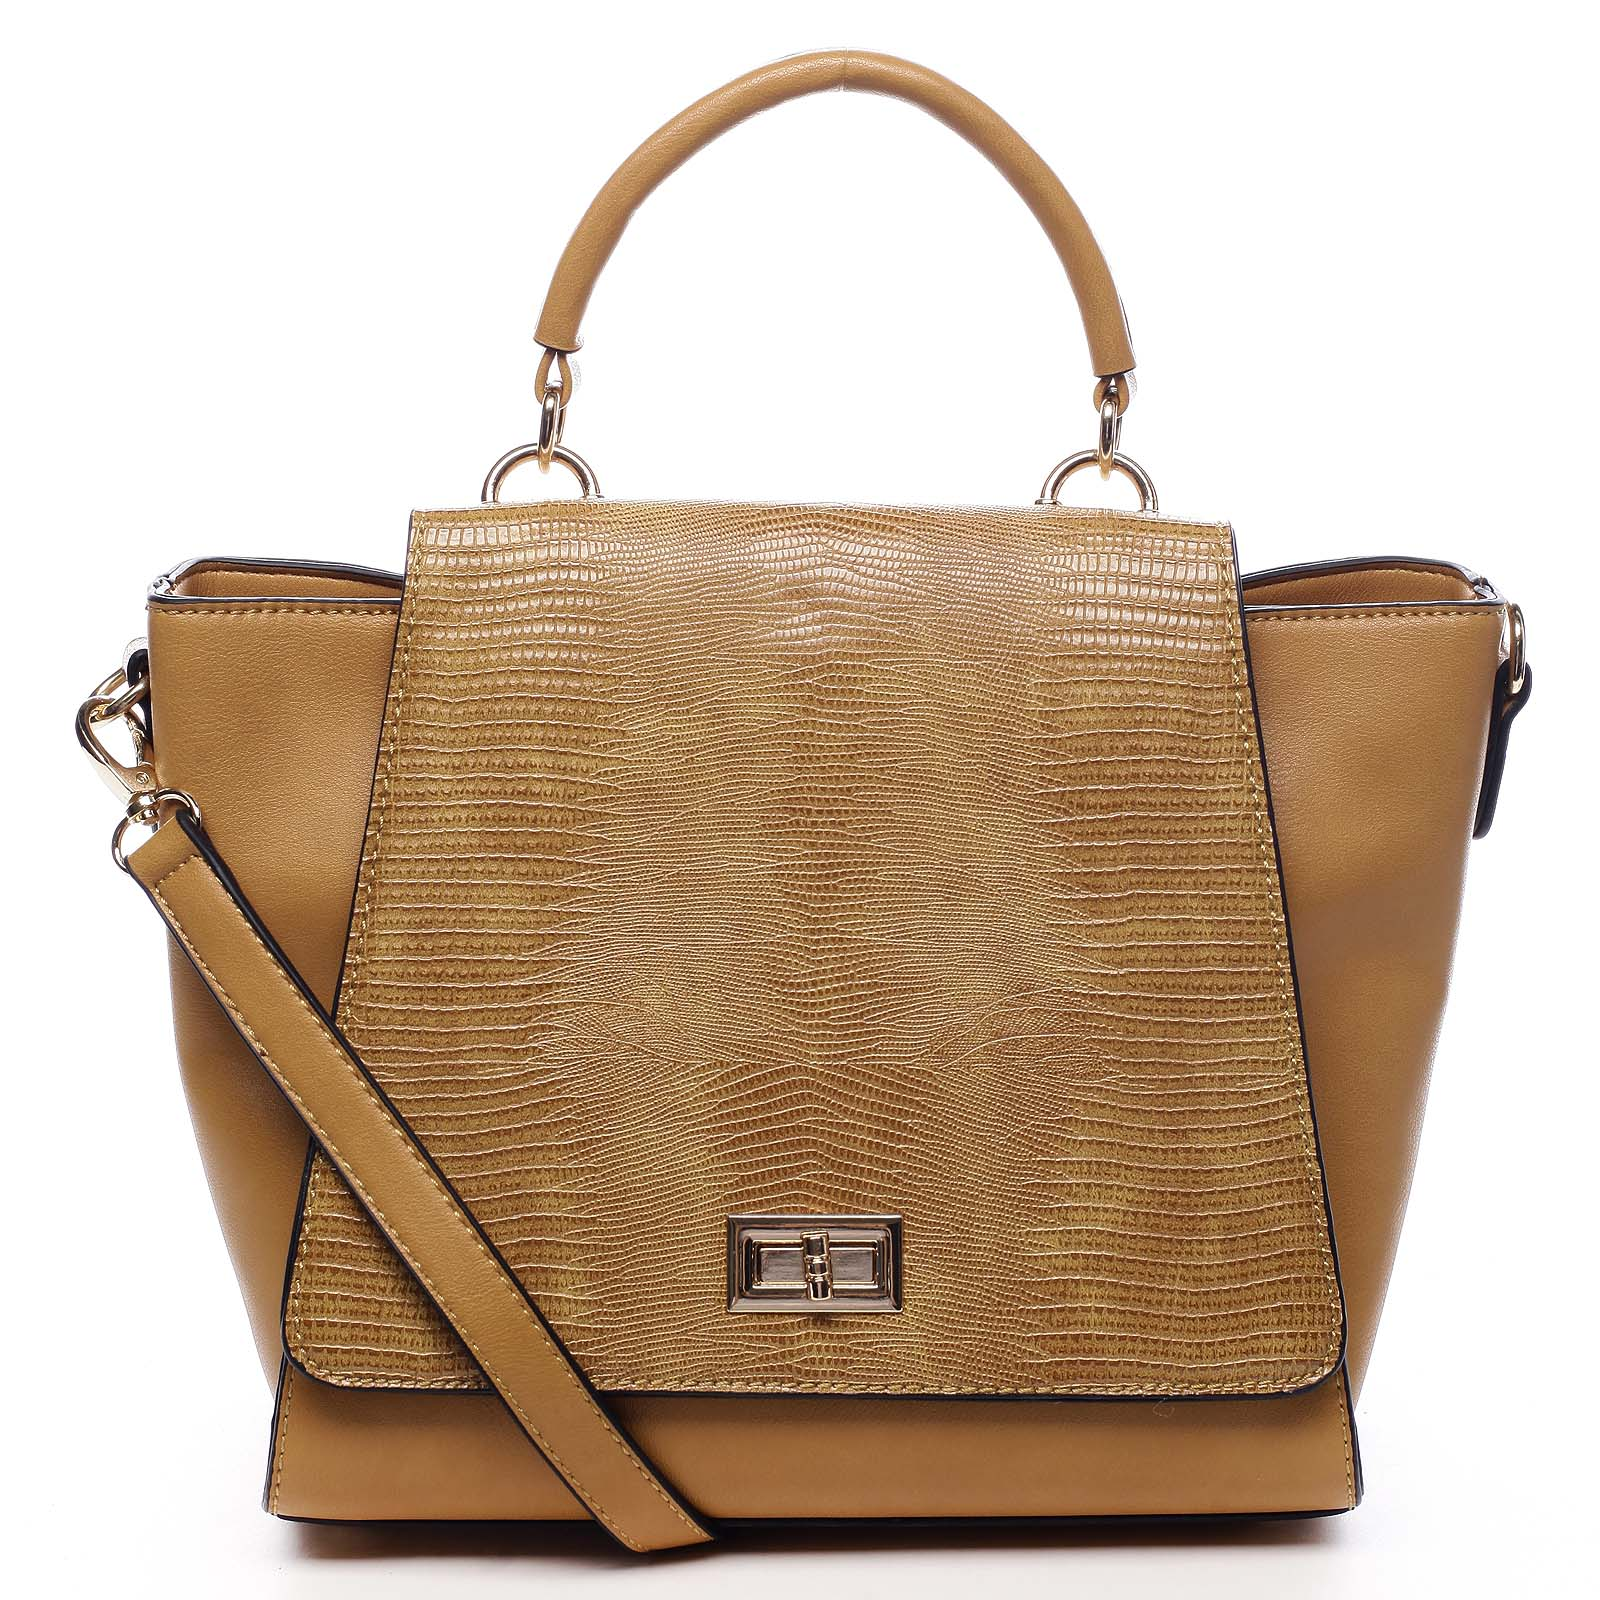 Dámská kabelka do ruky žlutá - Dudlin Mirla